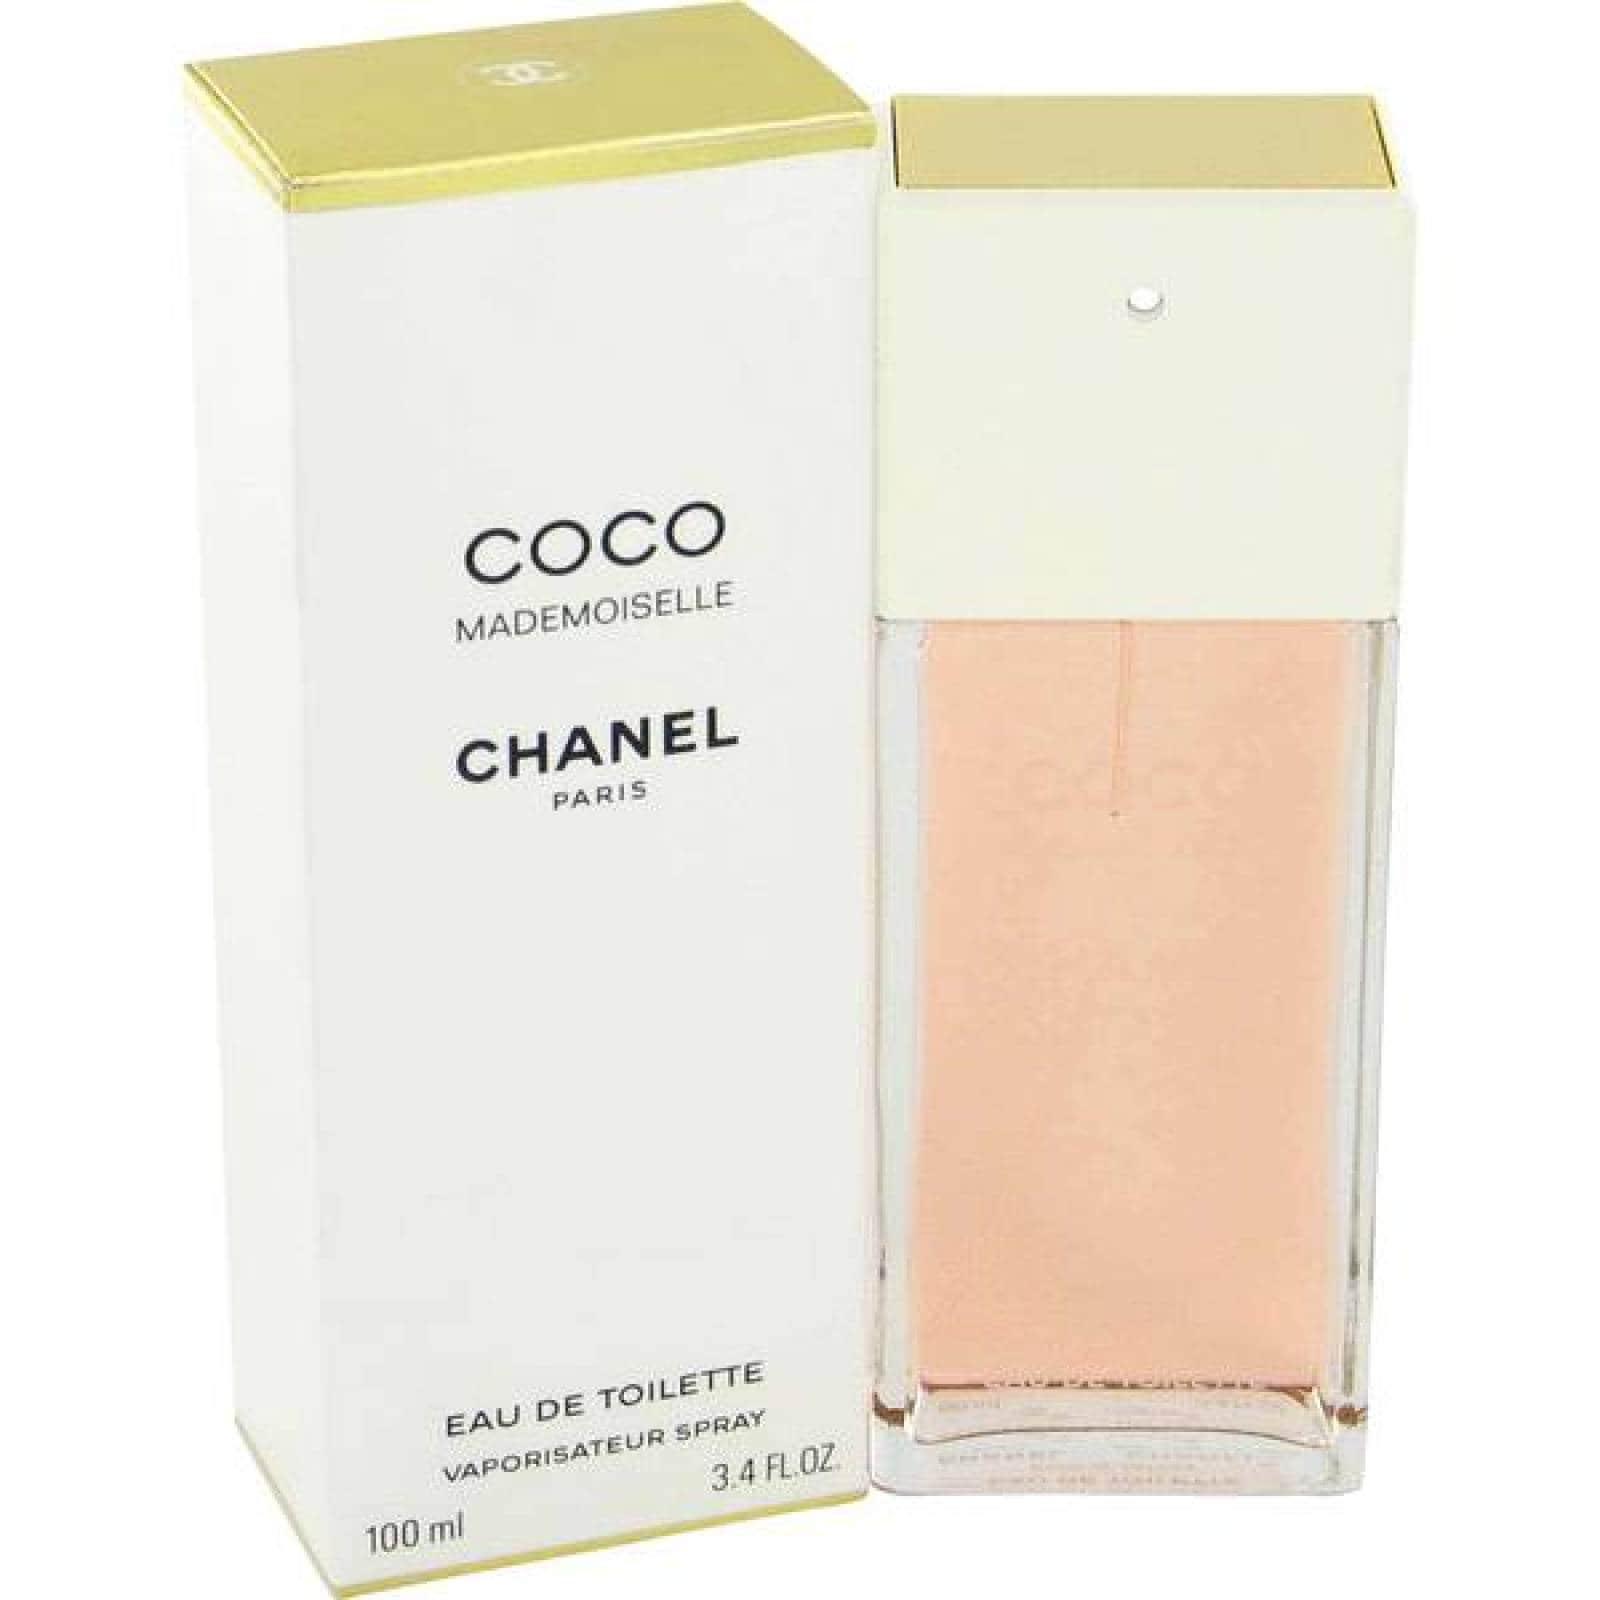 Coco Mademoiselle Dama Chanel 100 ml Edt Spray